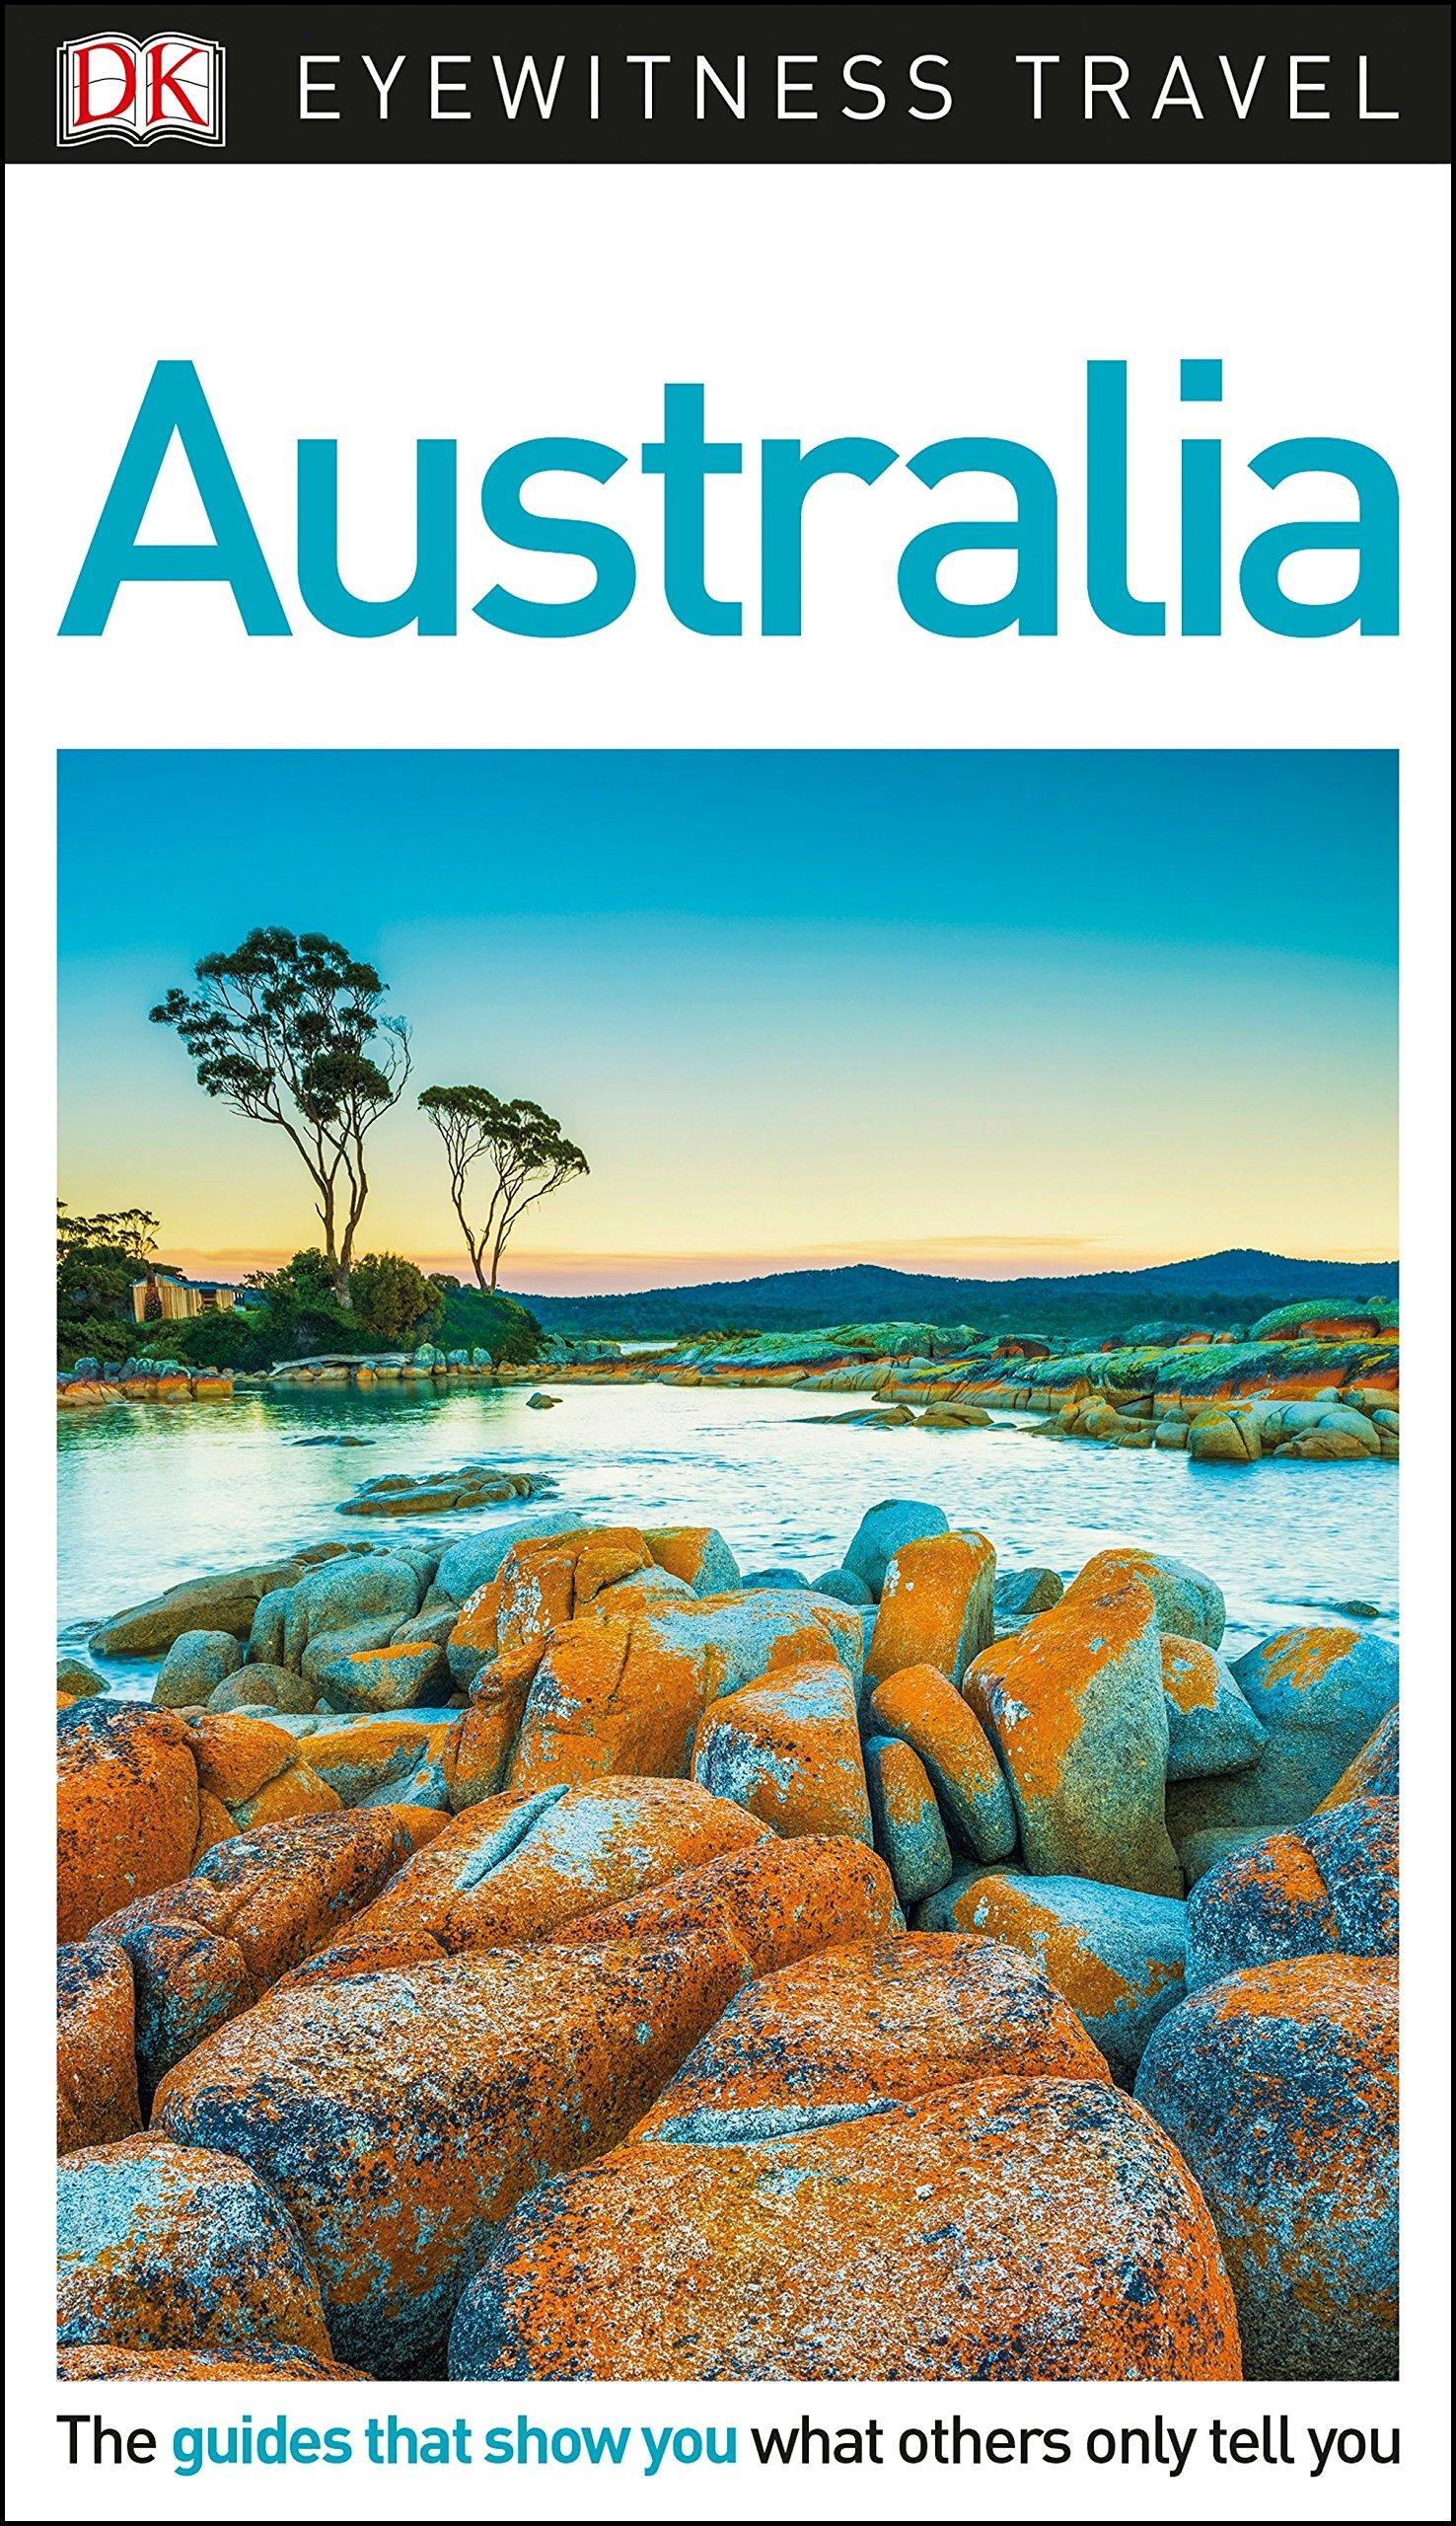 DK Eyewitness Travel Guide Australia - 912jjbDLDXL - Getting Down Under